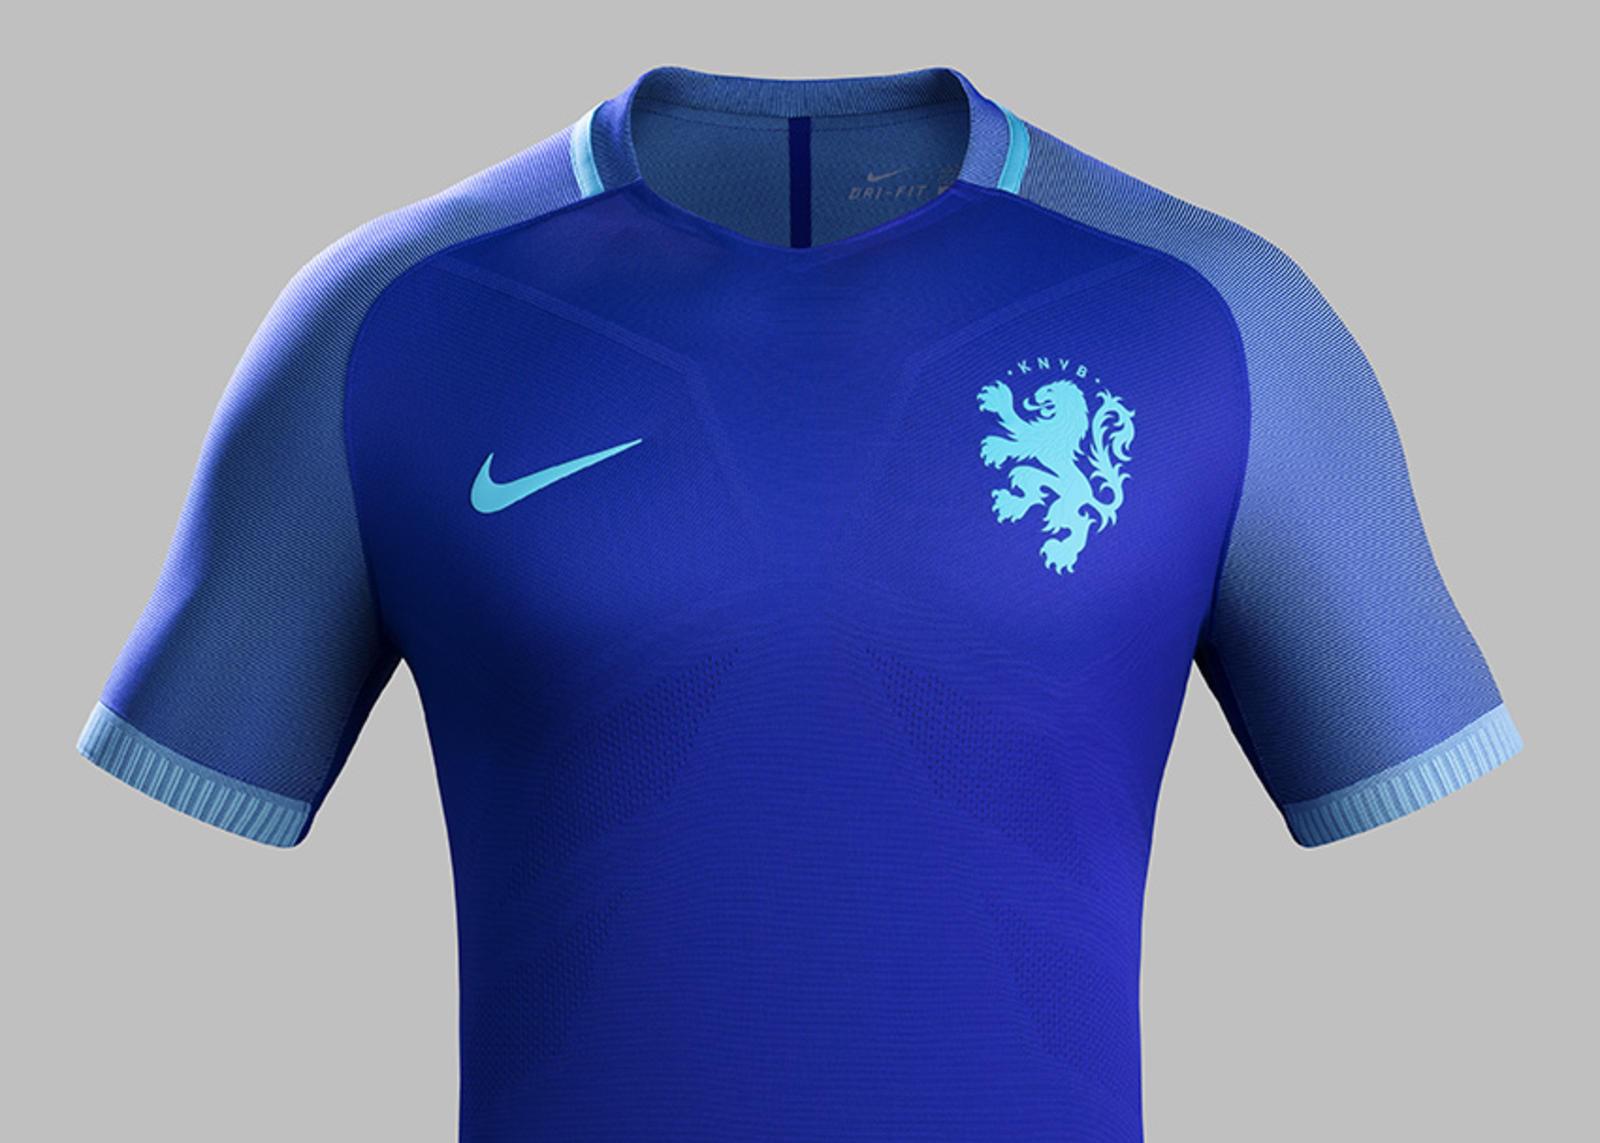 def8b3795 The Netherlands 2016 National Football Kits - Nike News